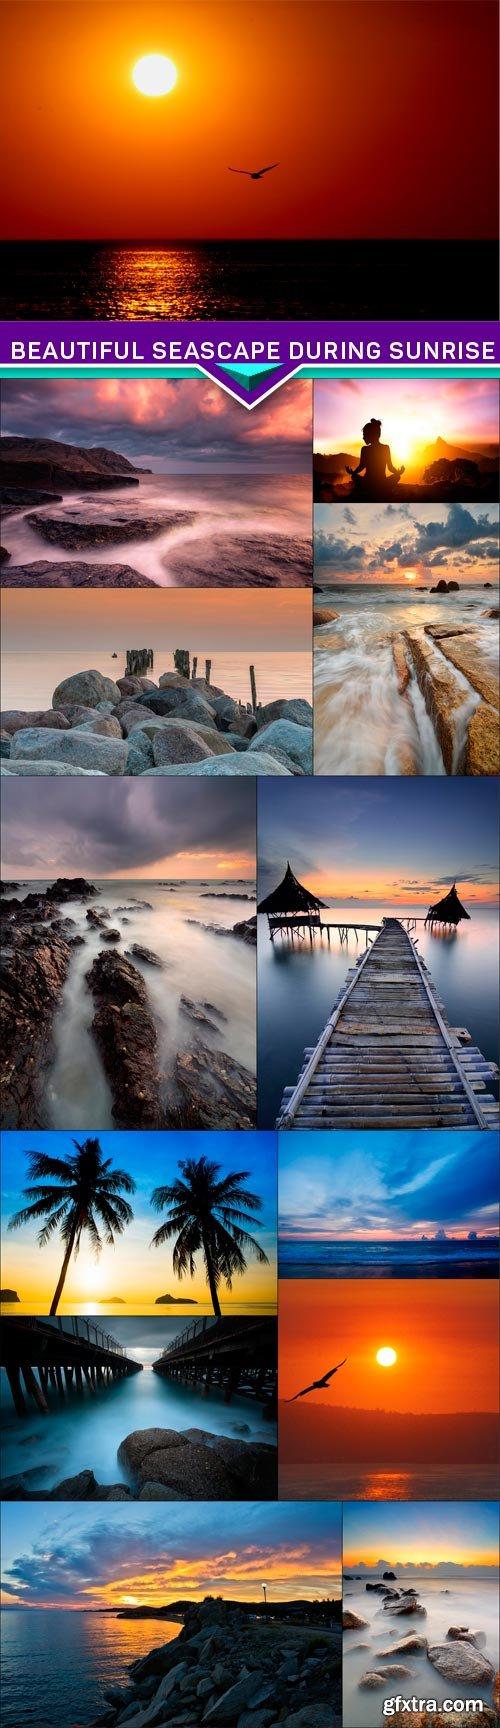 Beautiful seascape during sunrise 13x JPEG